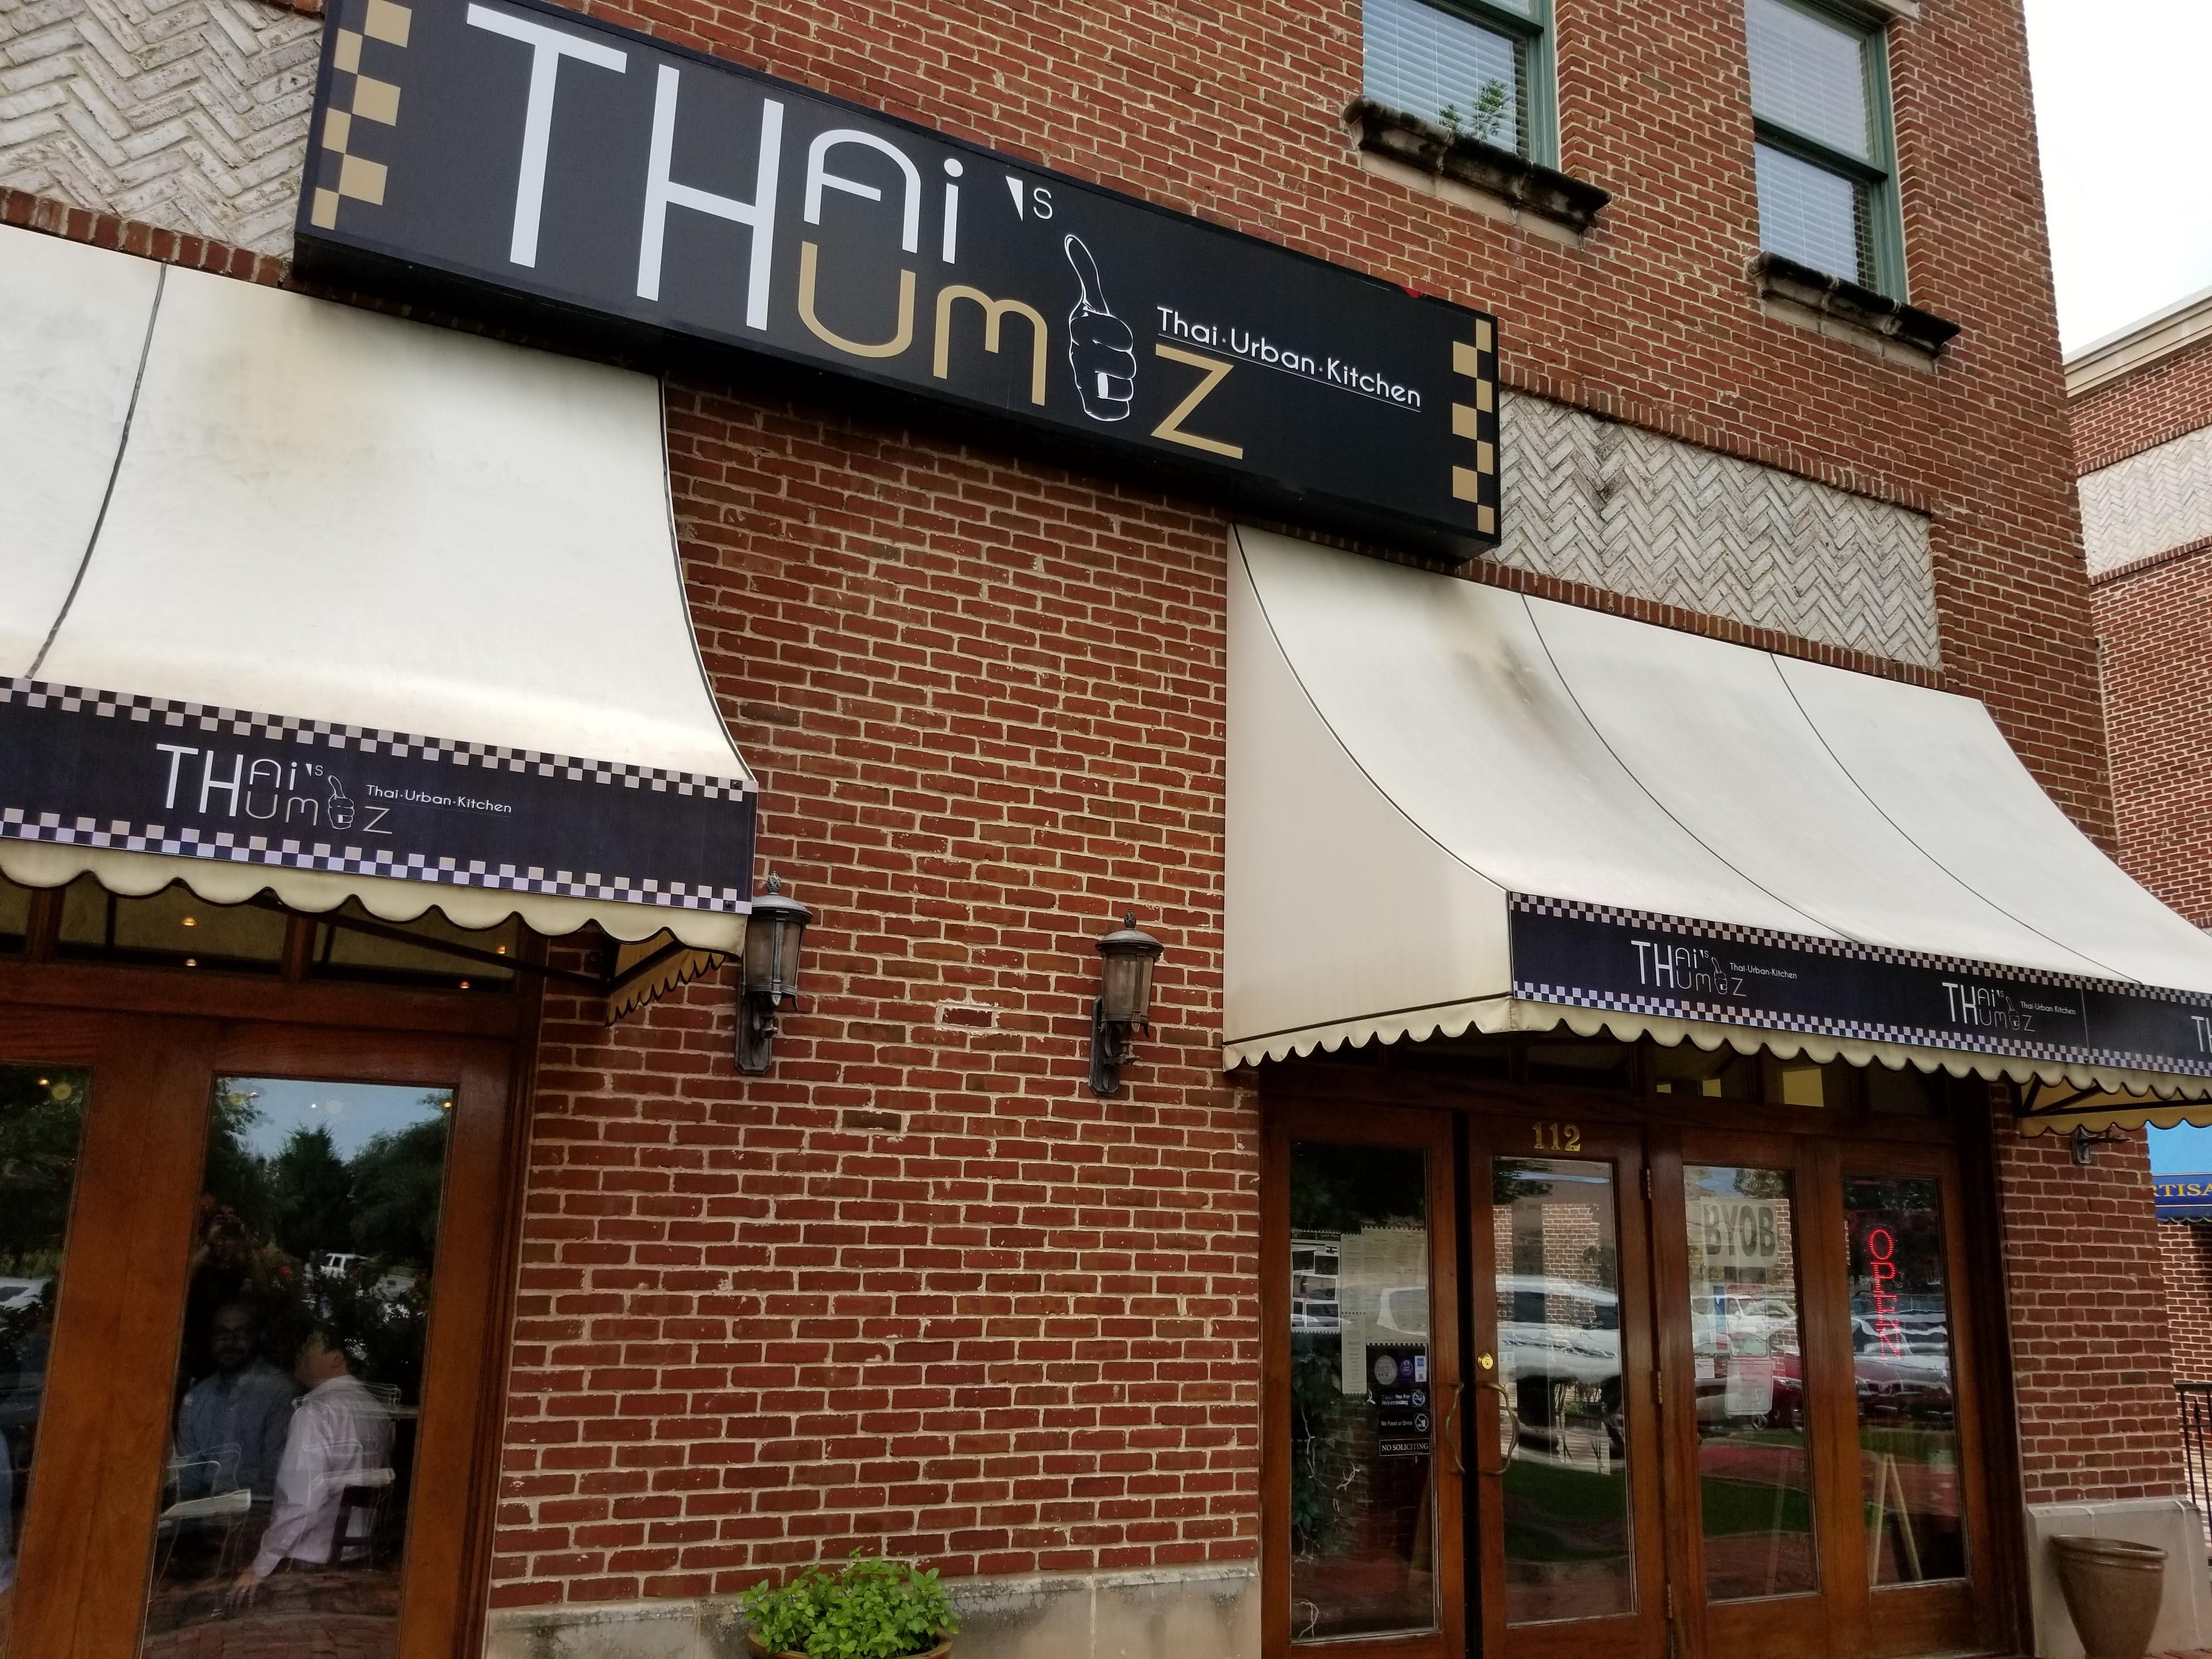 thai's thumbz urban kitchen - richardson | restaurant review - zagat